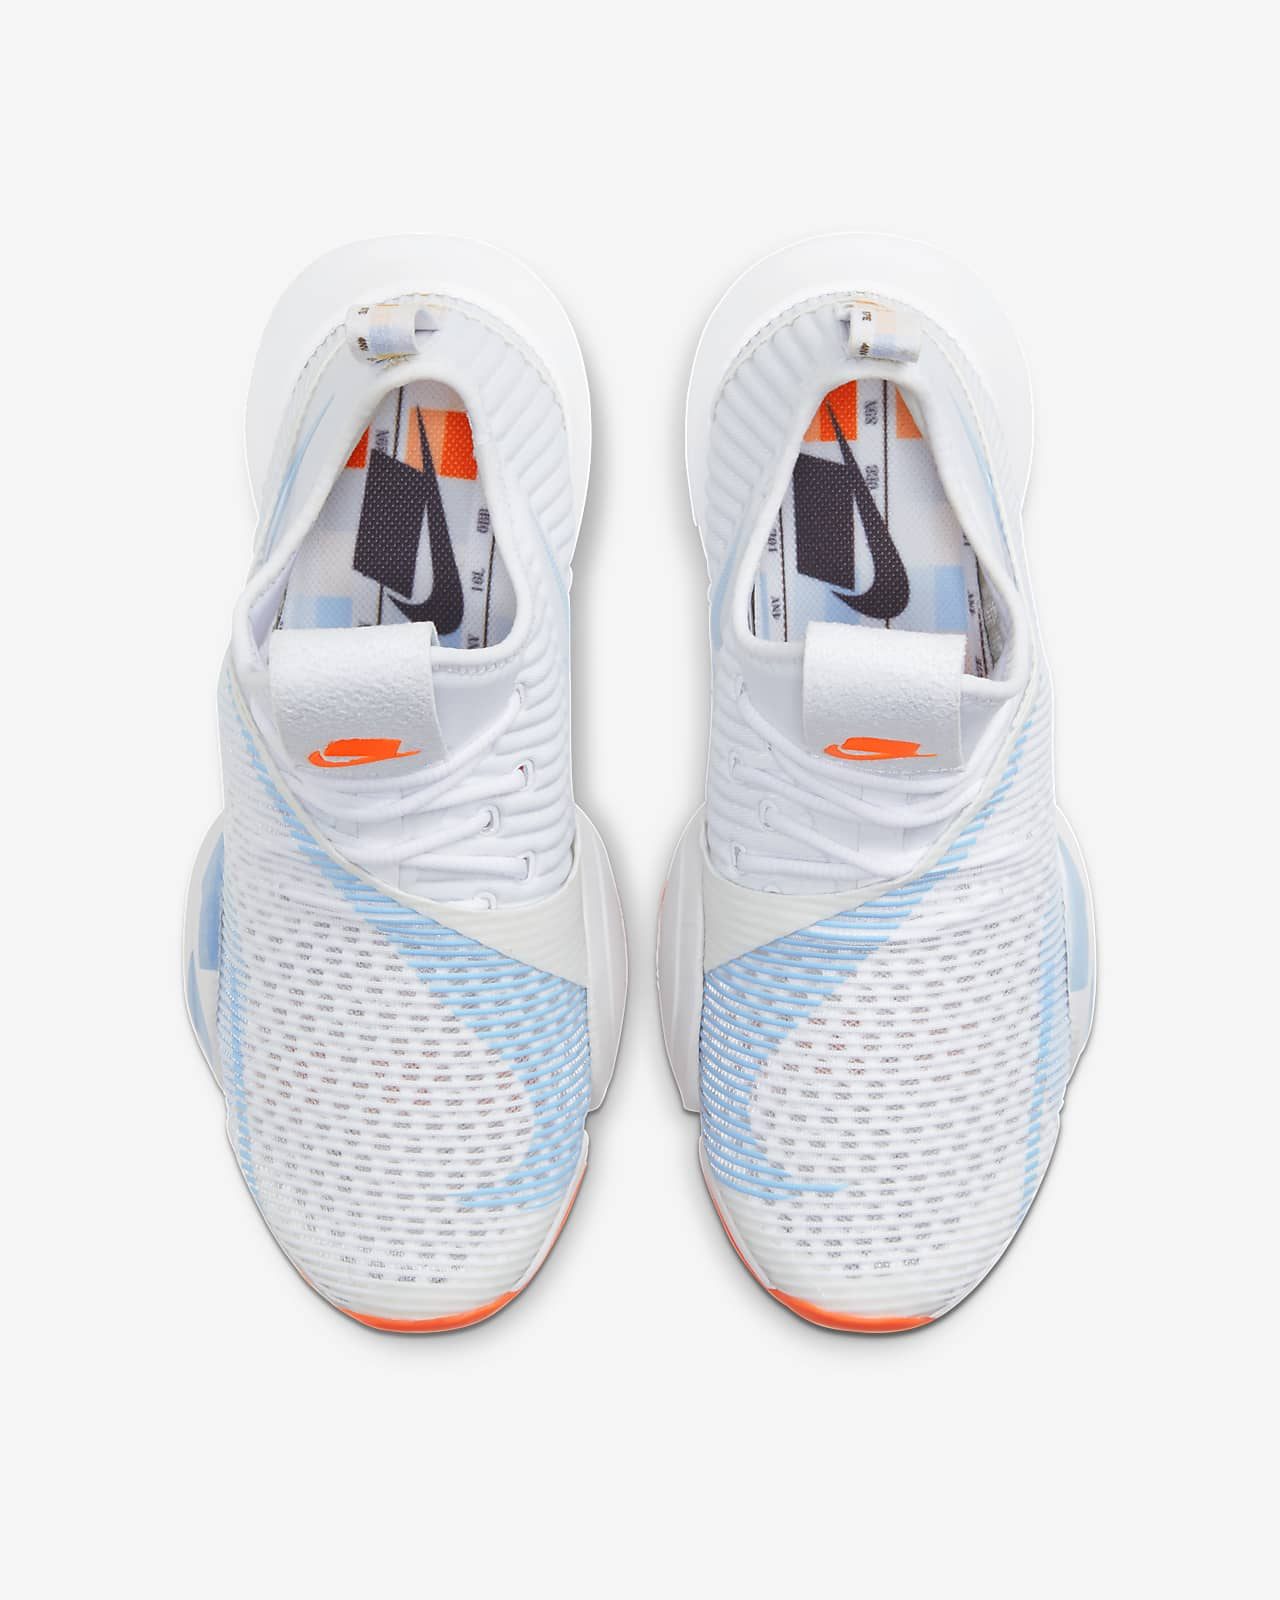 Nike Air Zoom SuperRep Premium Women's